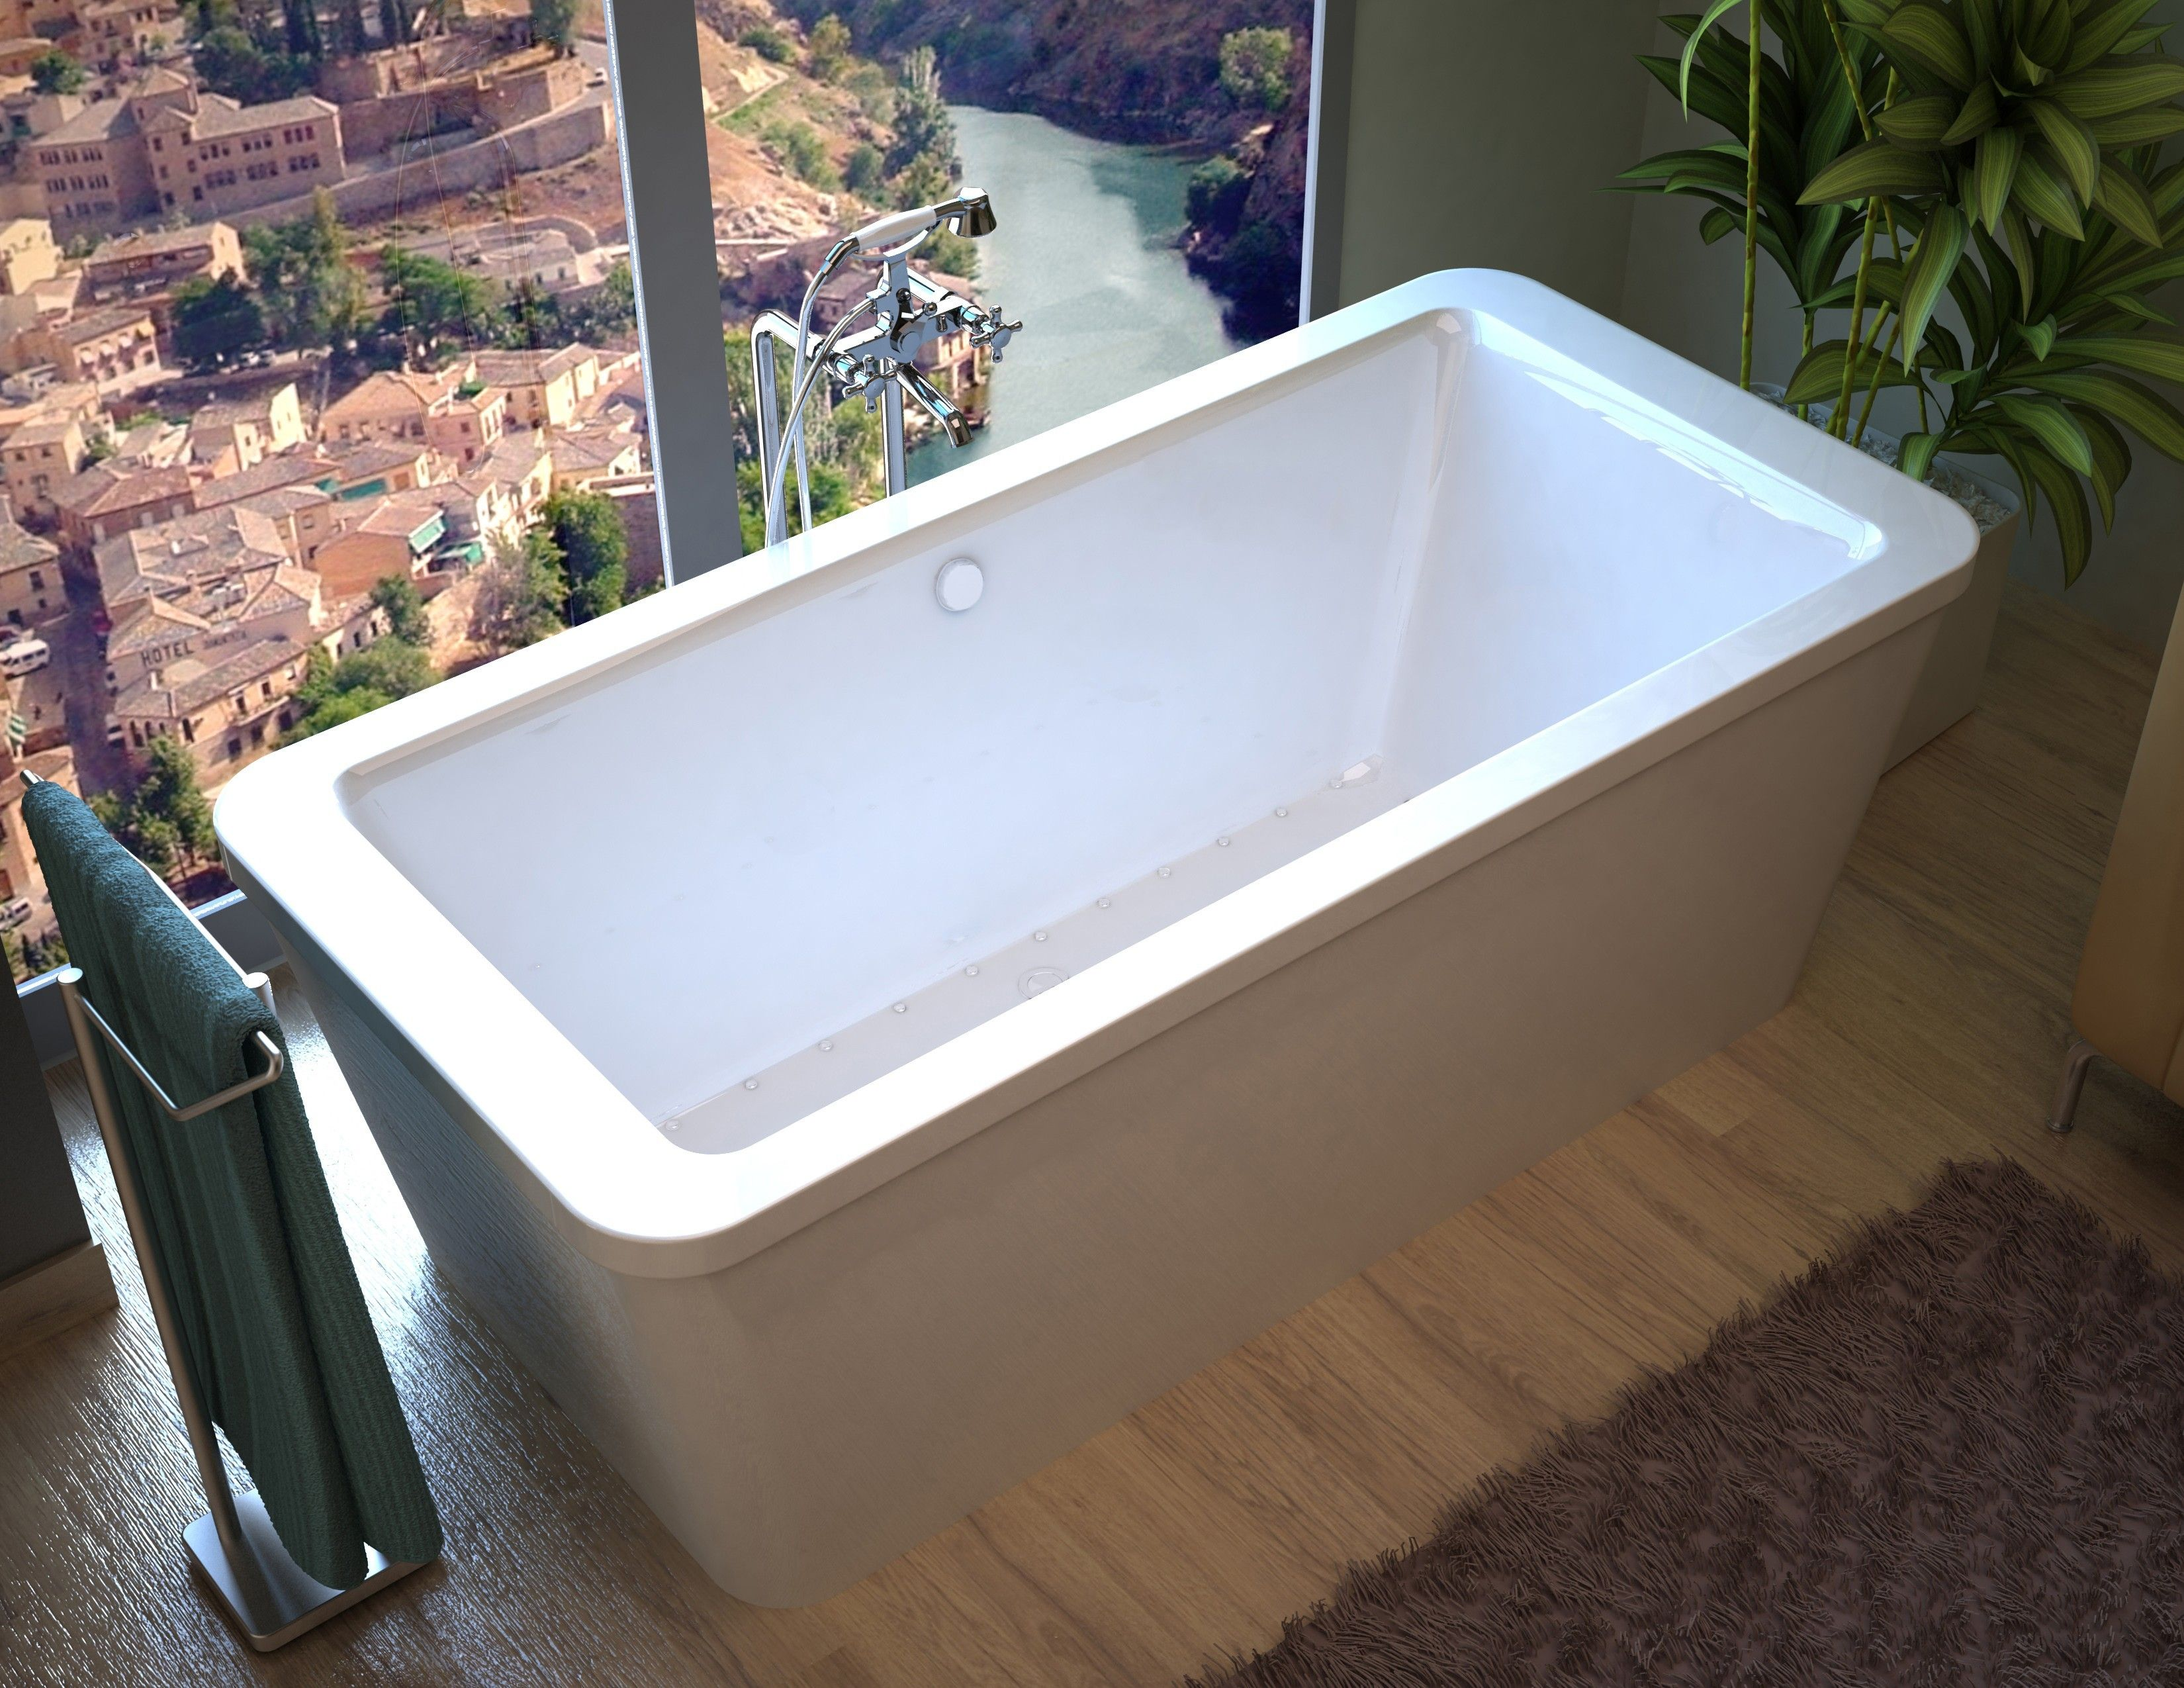 Lautrec 34x67-in. Freestanding Air Jetted Bathtub - White ...